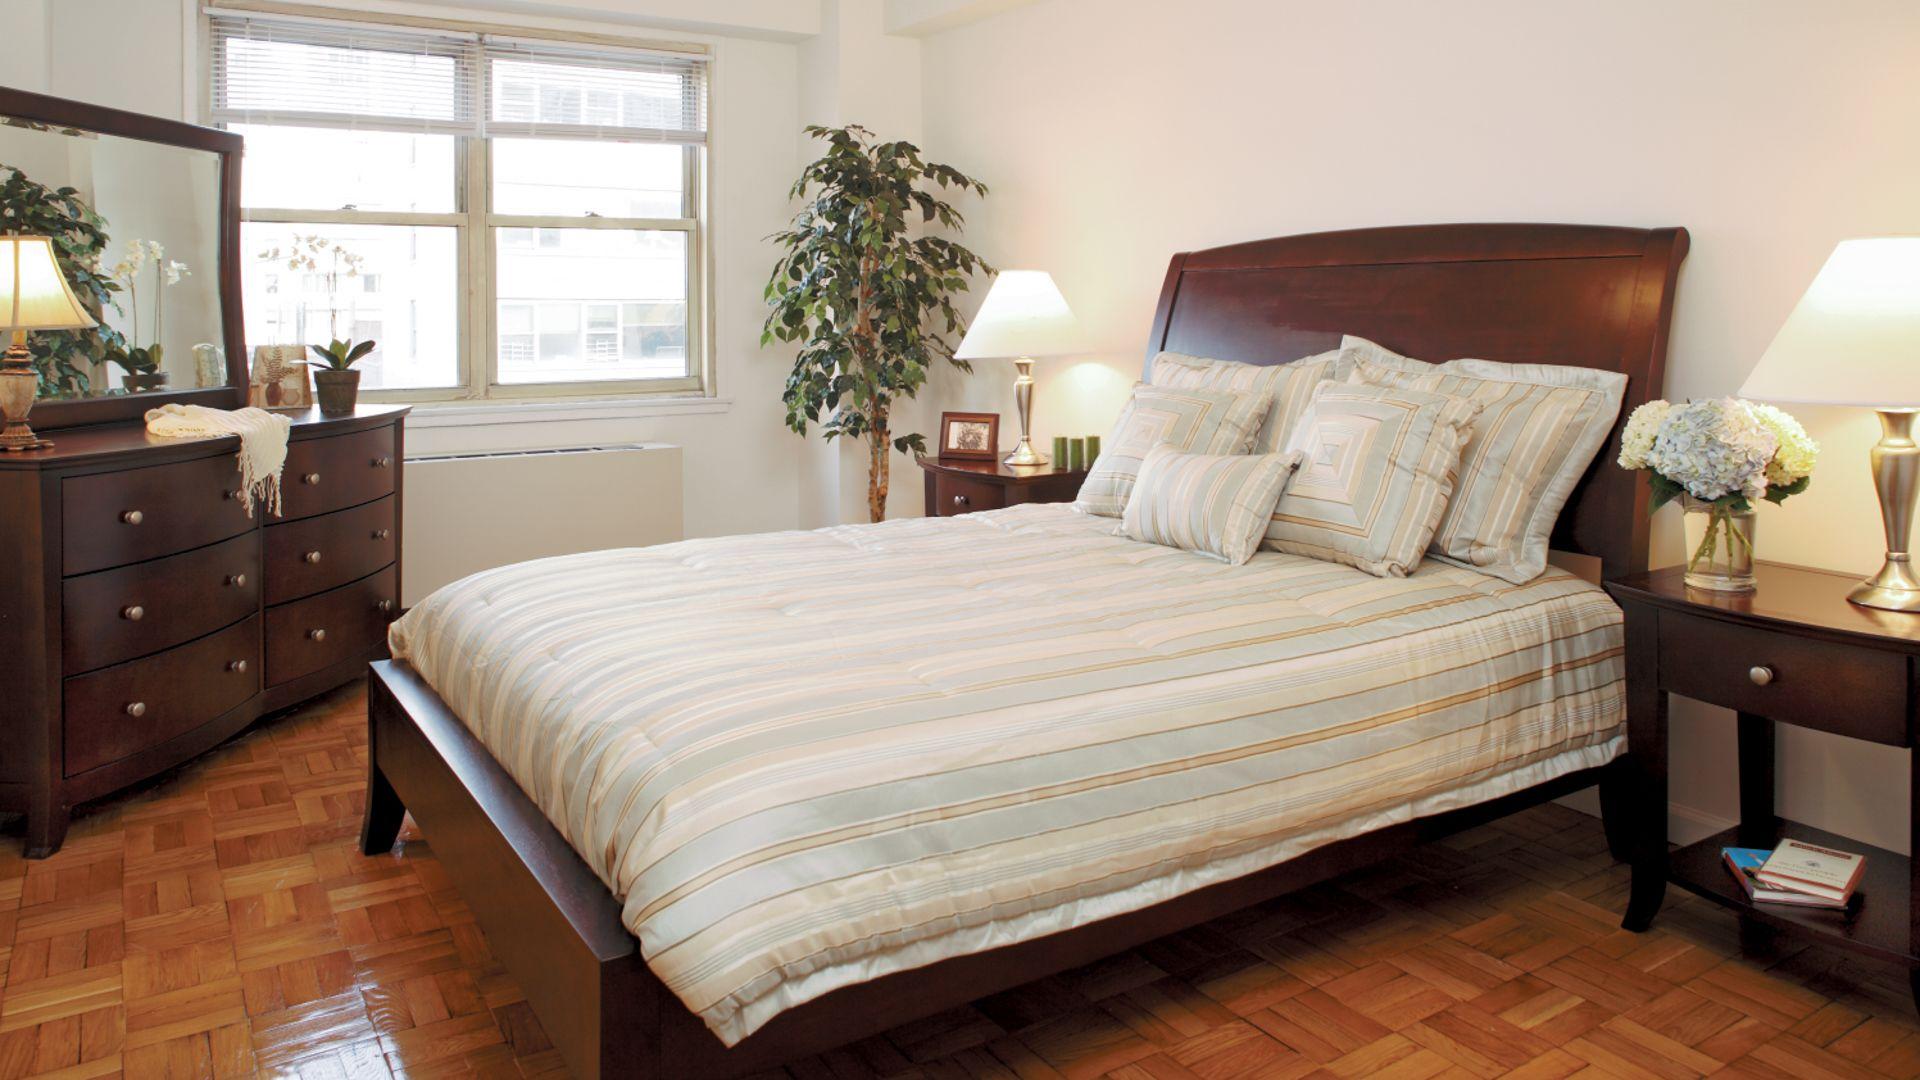 420 East 80th Street - Bedroom